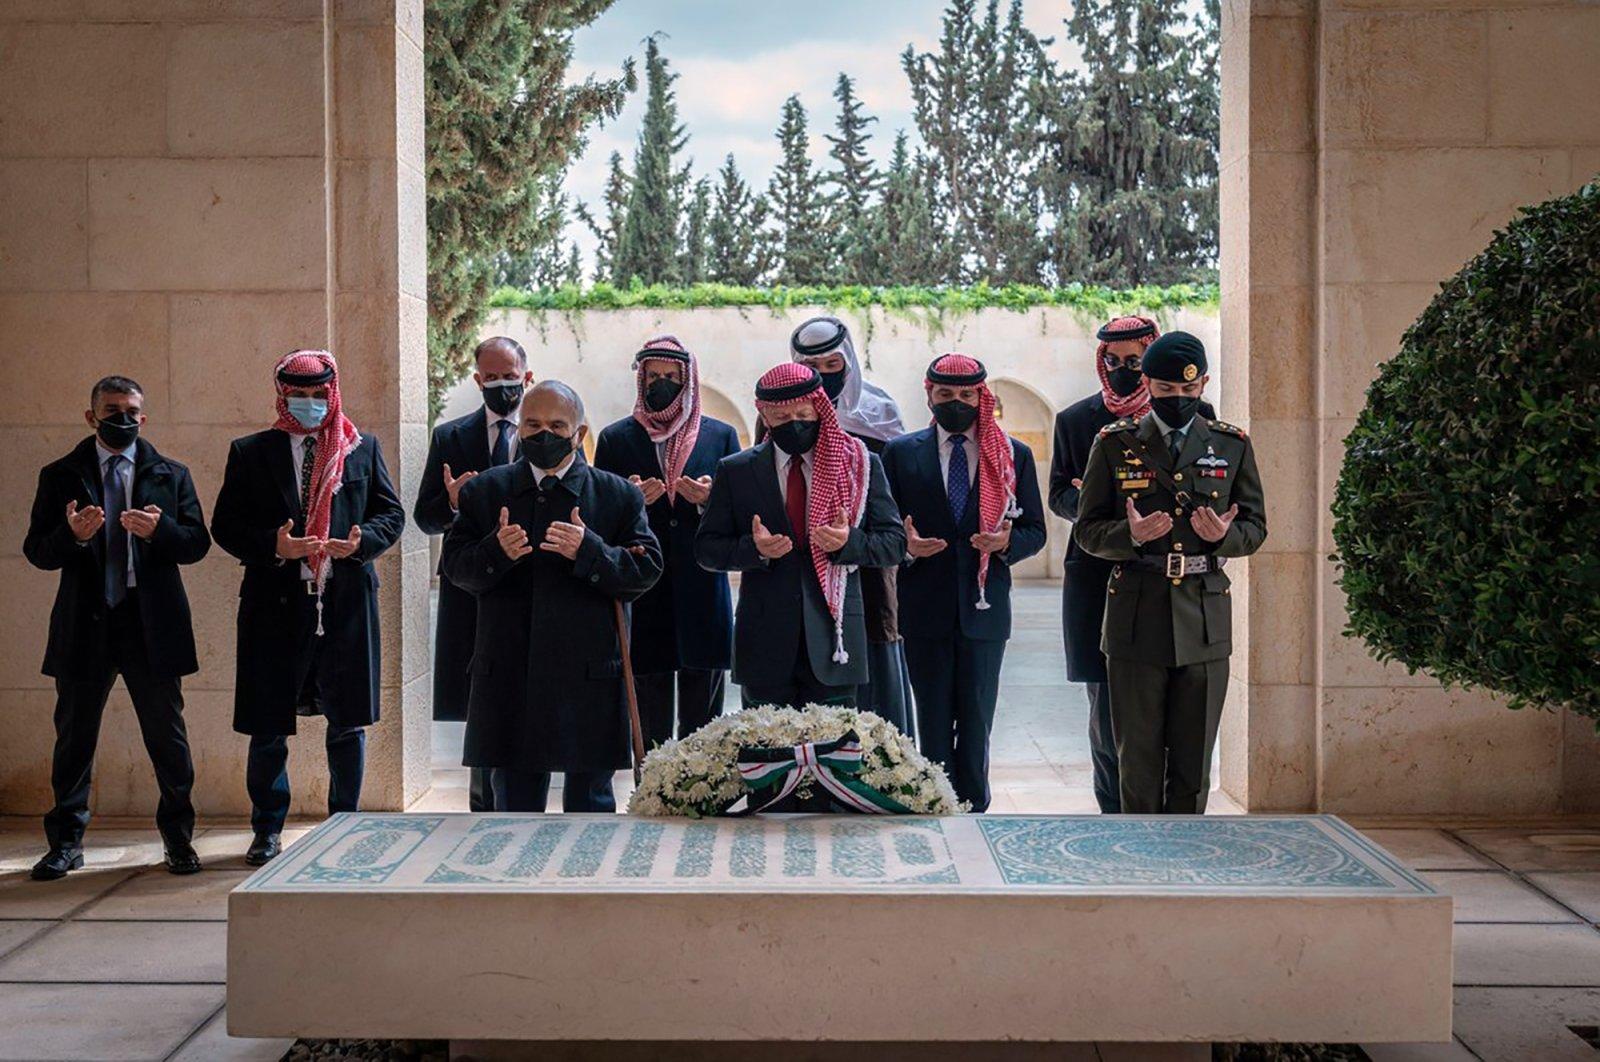 Jordan's King Abdullah II (C), Prince Hamzah (2L) and others during a visit to the tomb of the late King Hussein, Amman, Jordan,  April 11, 2021. (AP Photo)